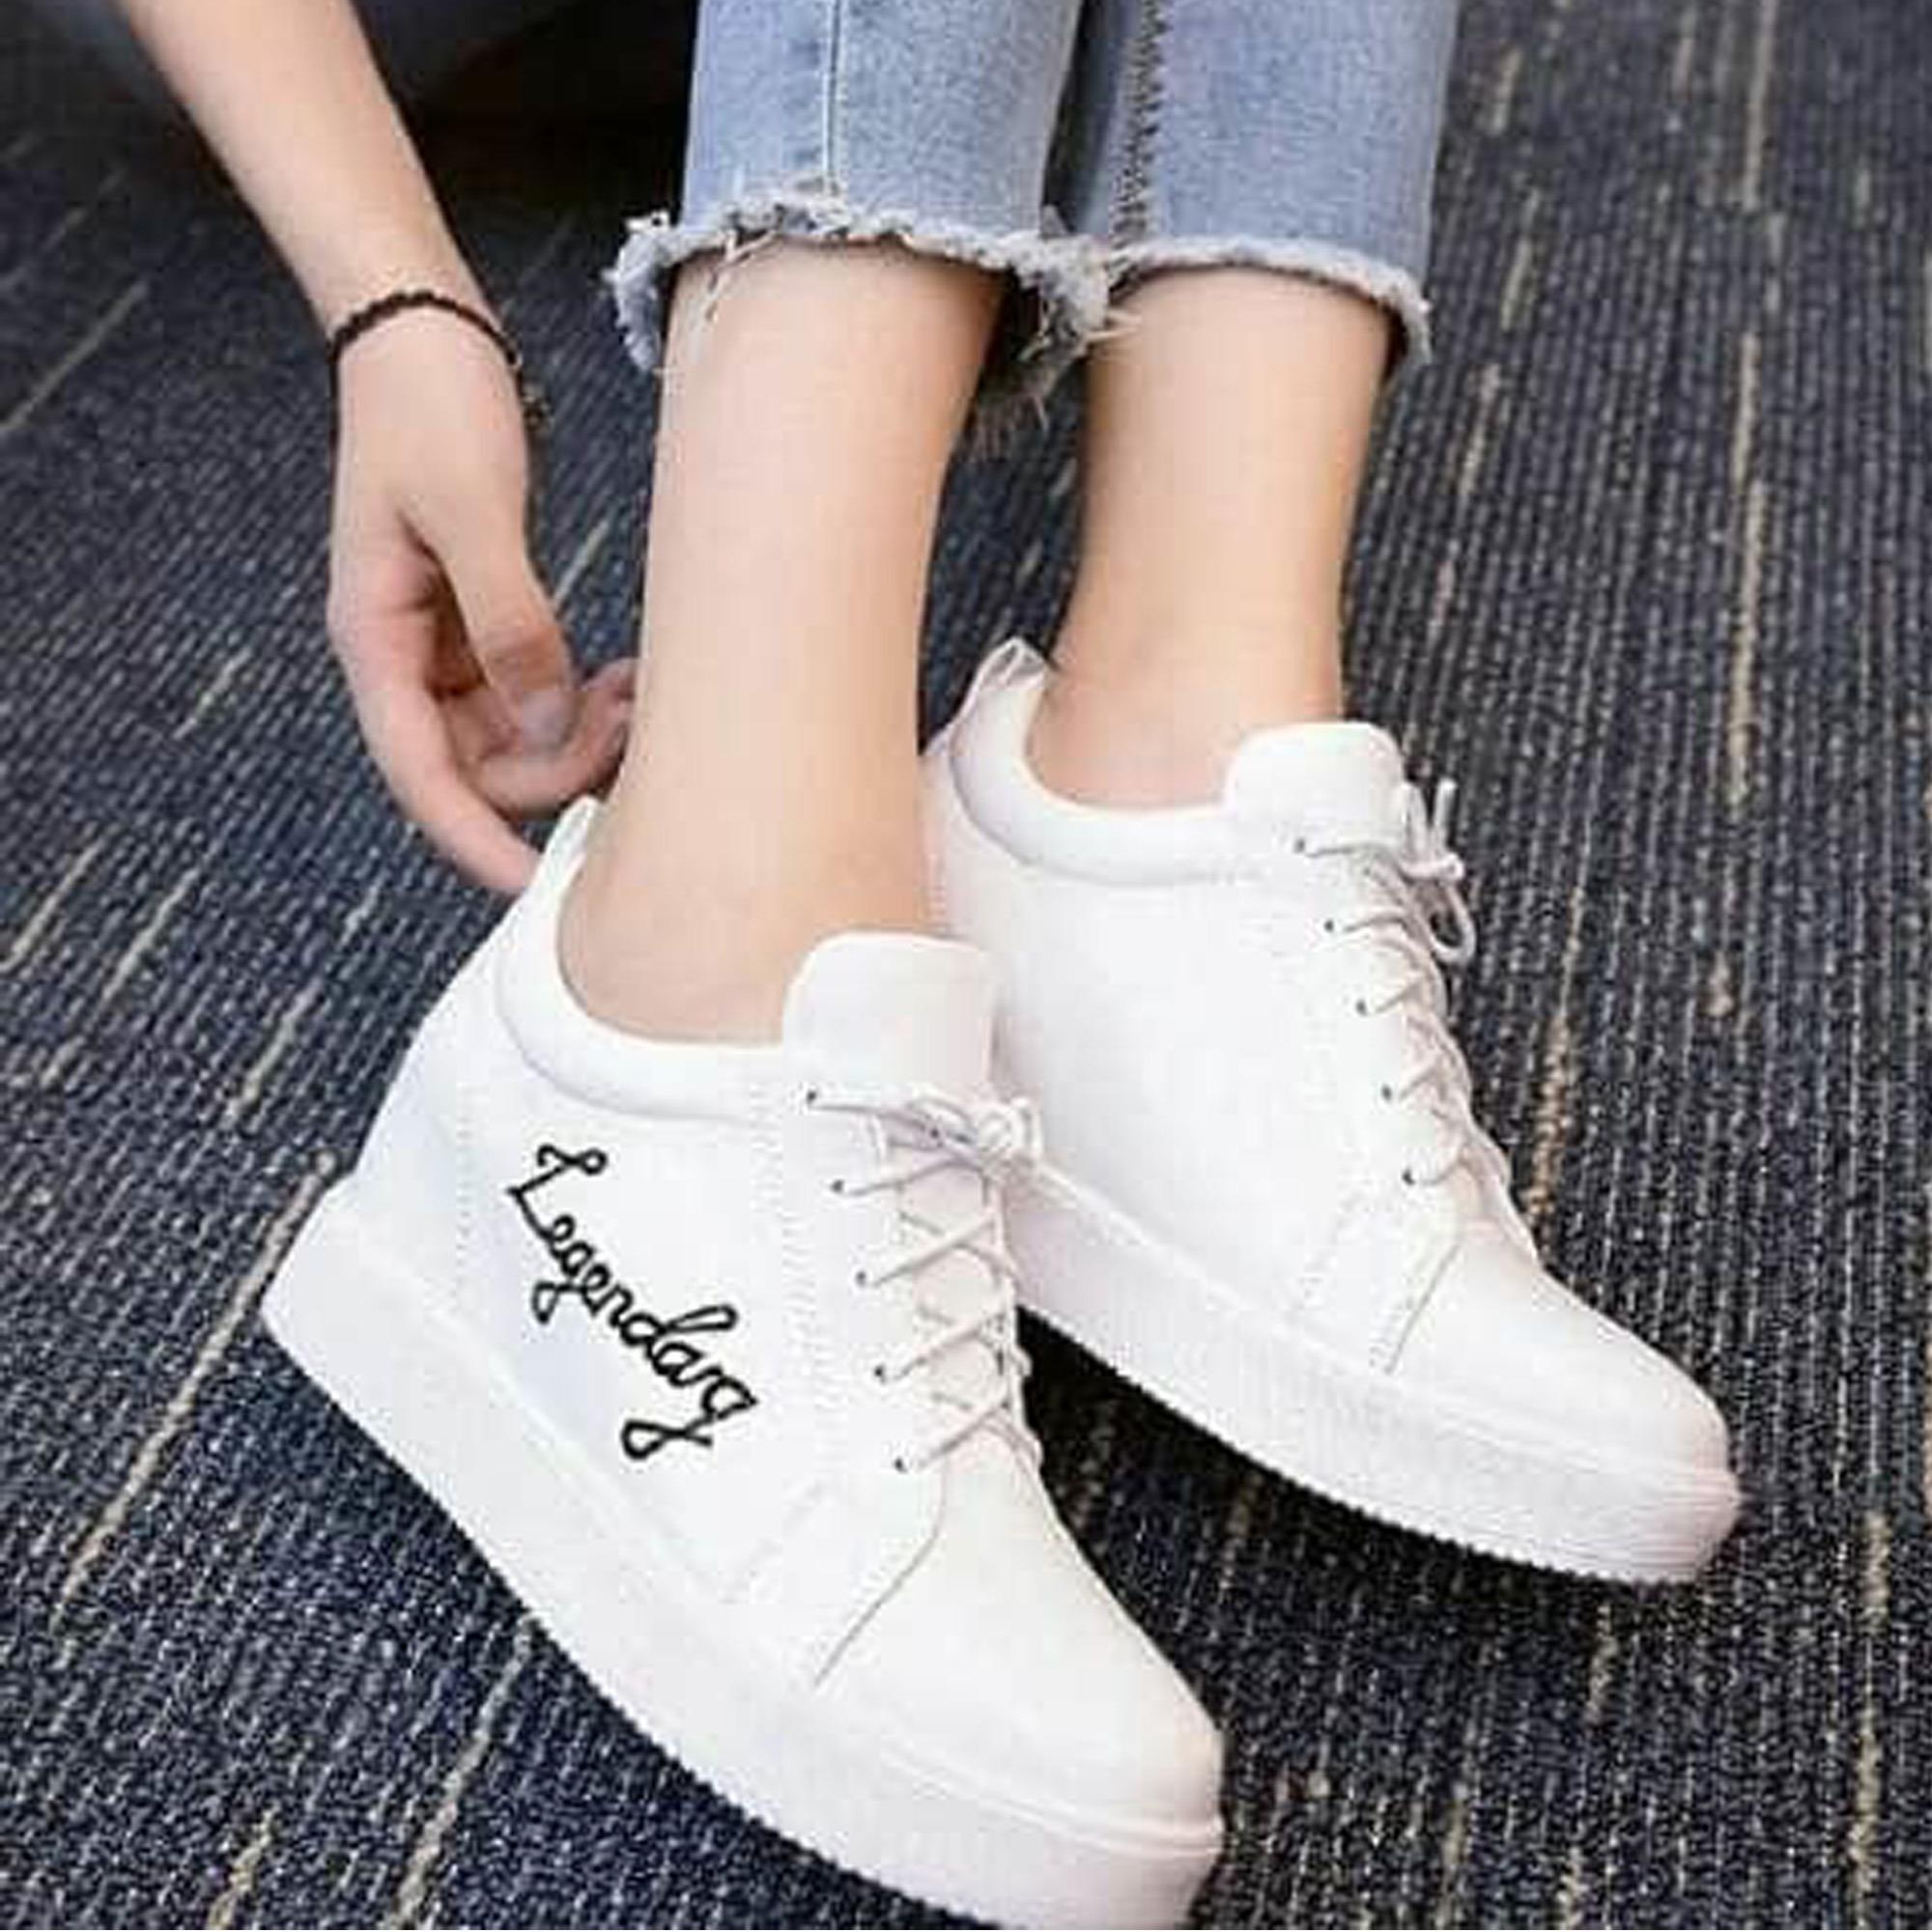 Jual Femine Sepatu Wanita Boots Legendary Lg01 Putih Femine Ori